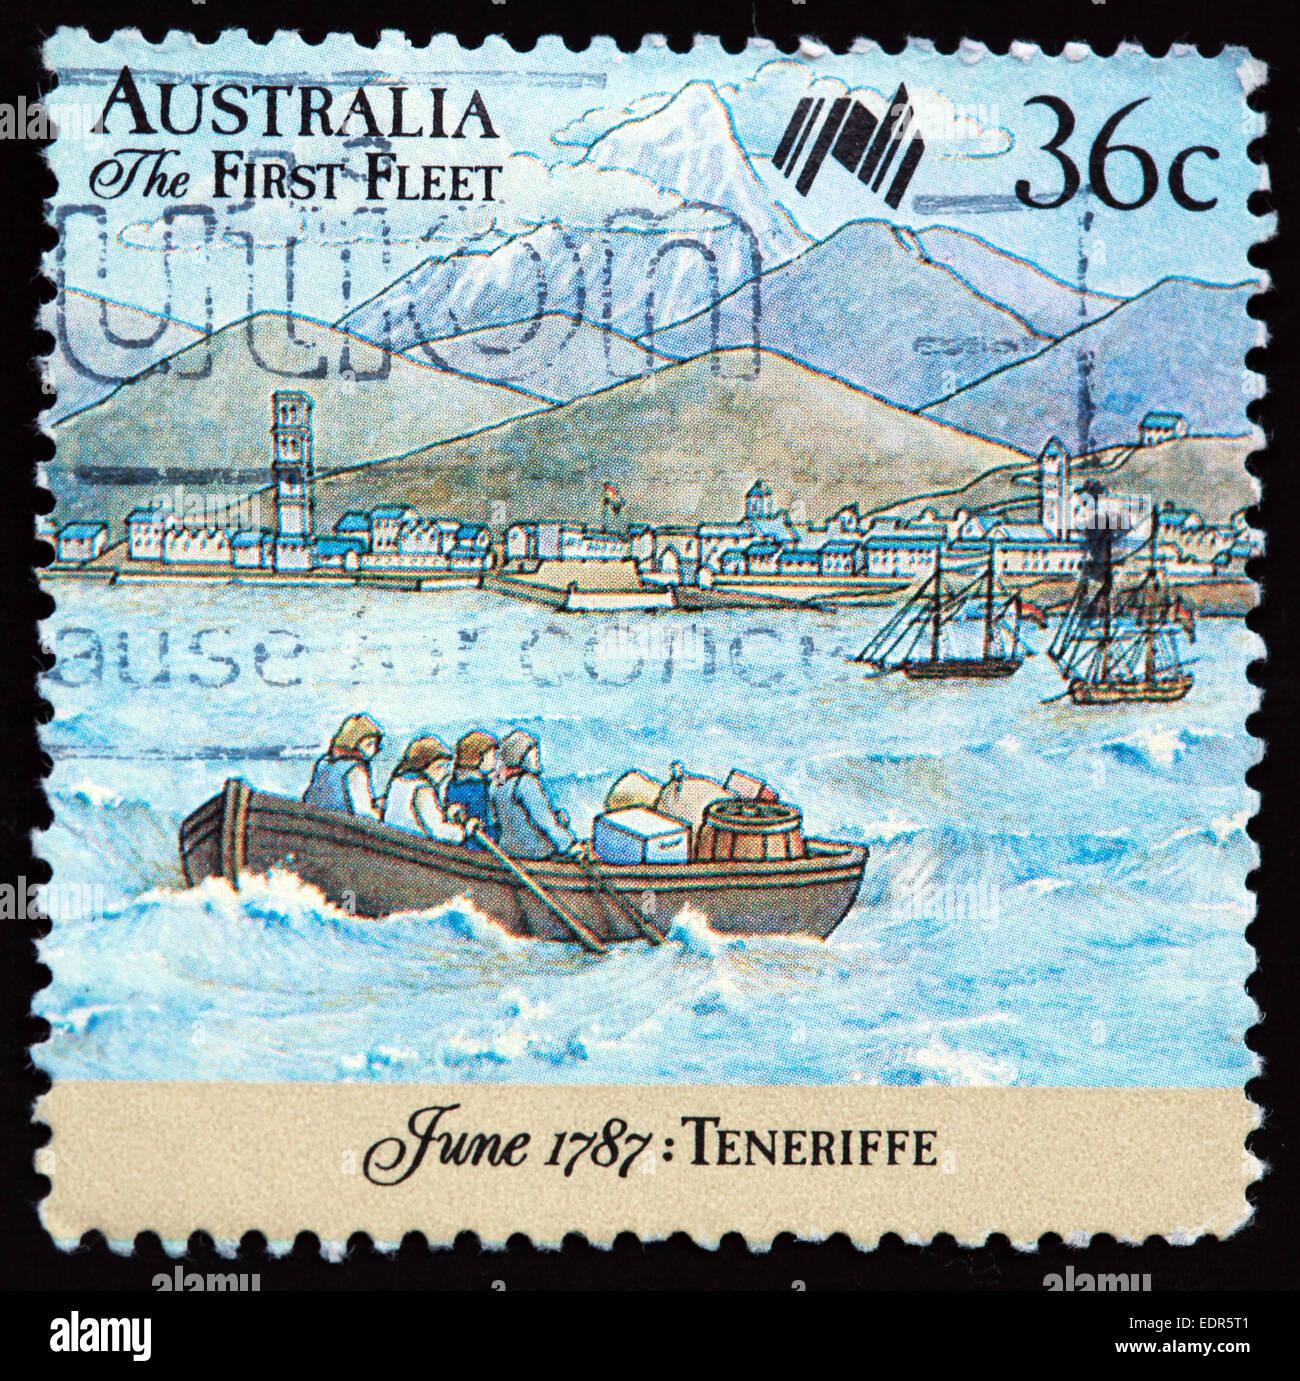 Used and postmarked Australia / Austrailian Stamp 36c The first Fleet June 1787 Teneriffe Stock Photo